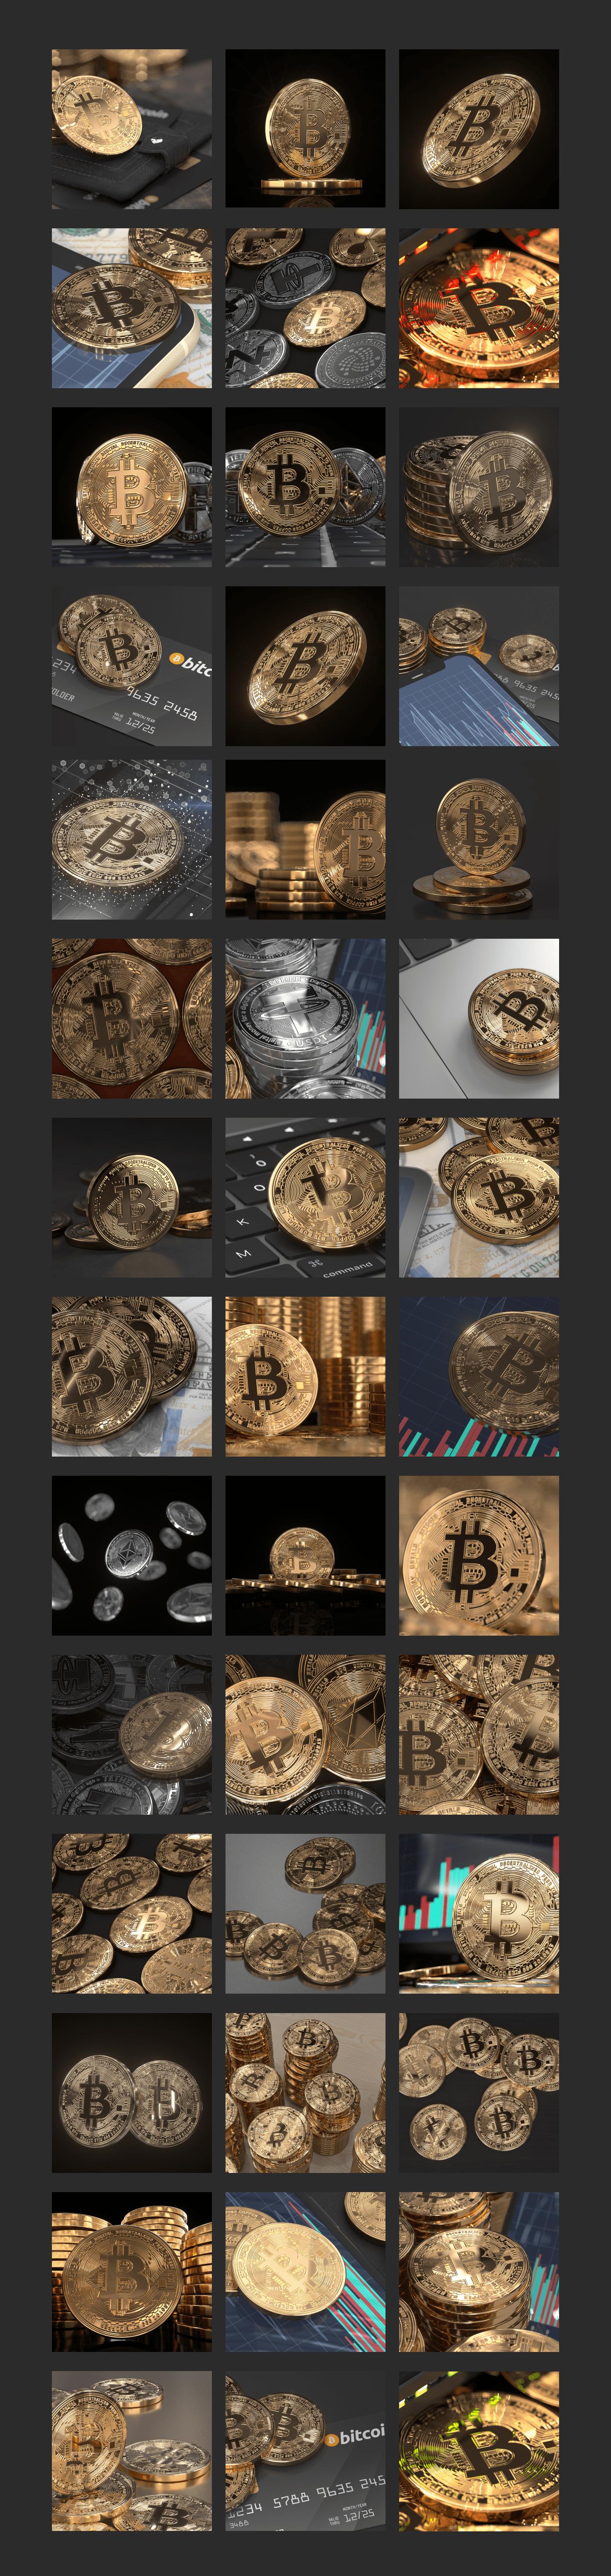 Bitcoin, Ethereum, Tether, Dashcoin, IOTA, zCash, Eoscoin, XRP Coin, Monero, Litecoin, Dogecoin, NFT, Digital art, digital money, investment, economy, finance, investment, digital investment, virtual, technology, future, money, payment, transaction, wealth, mining, digital currency, network, internet